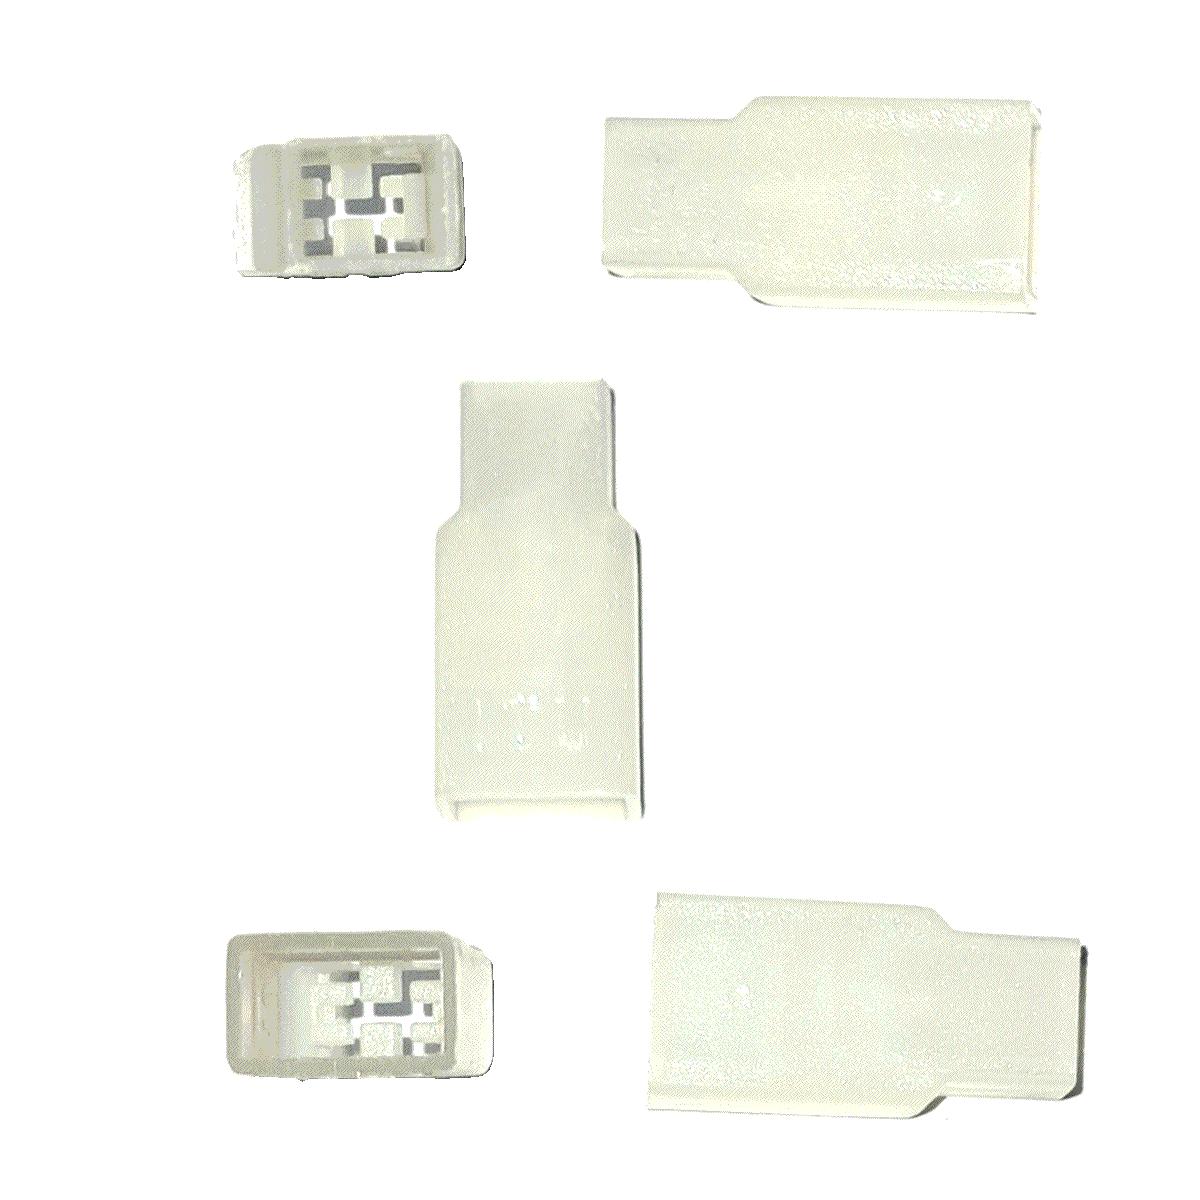 Capa Terminal Macho Curto 6,3 mm cor Natural em Poliestileno